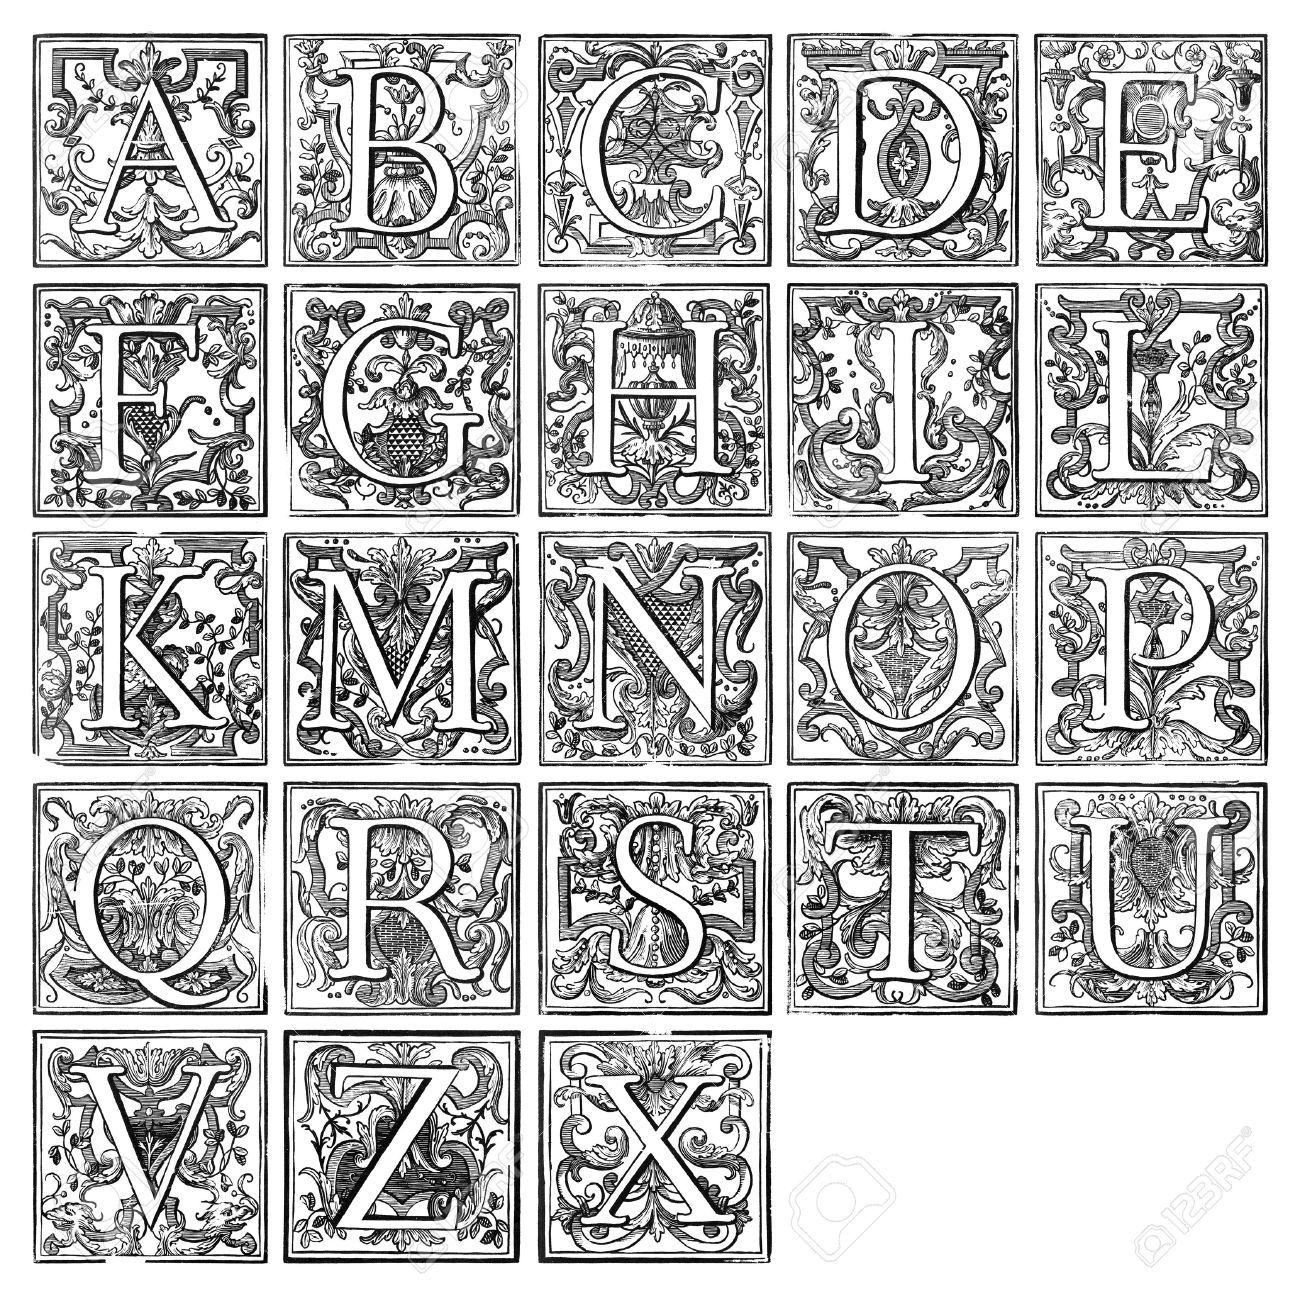 illuminated alphabet templates - renaissance calligraphy google latters